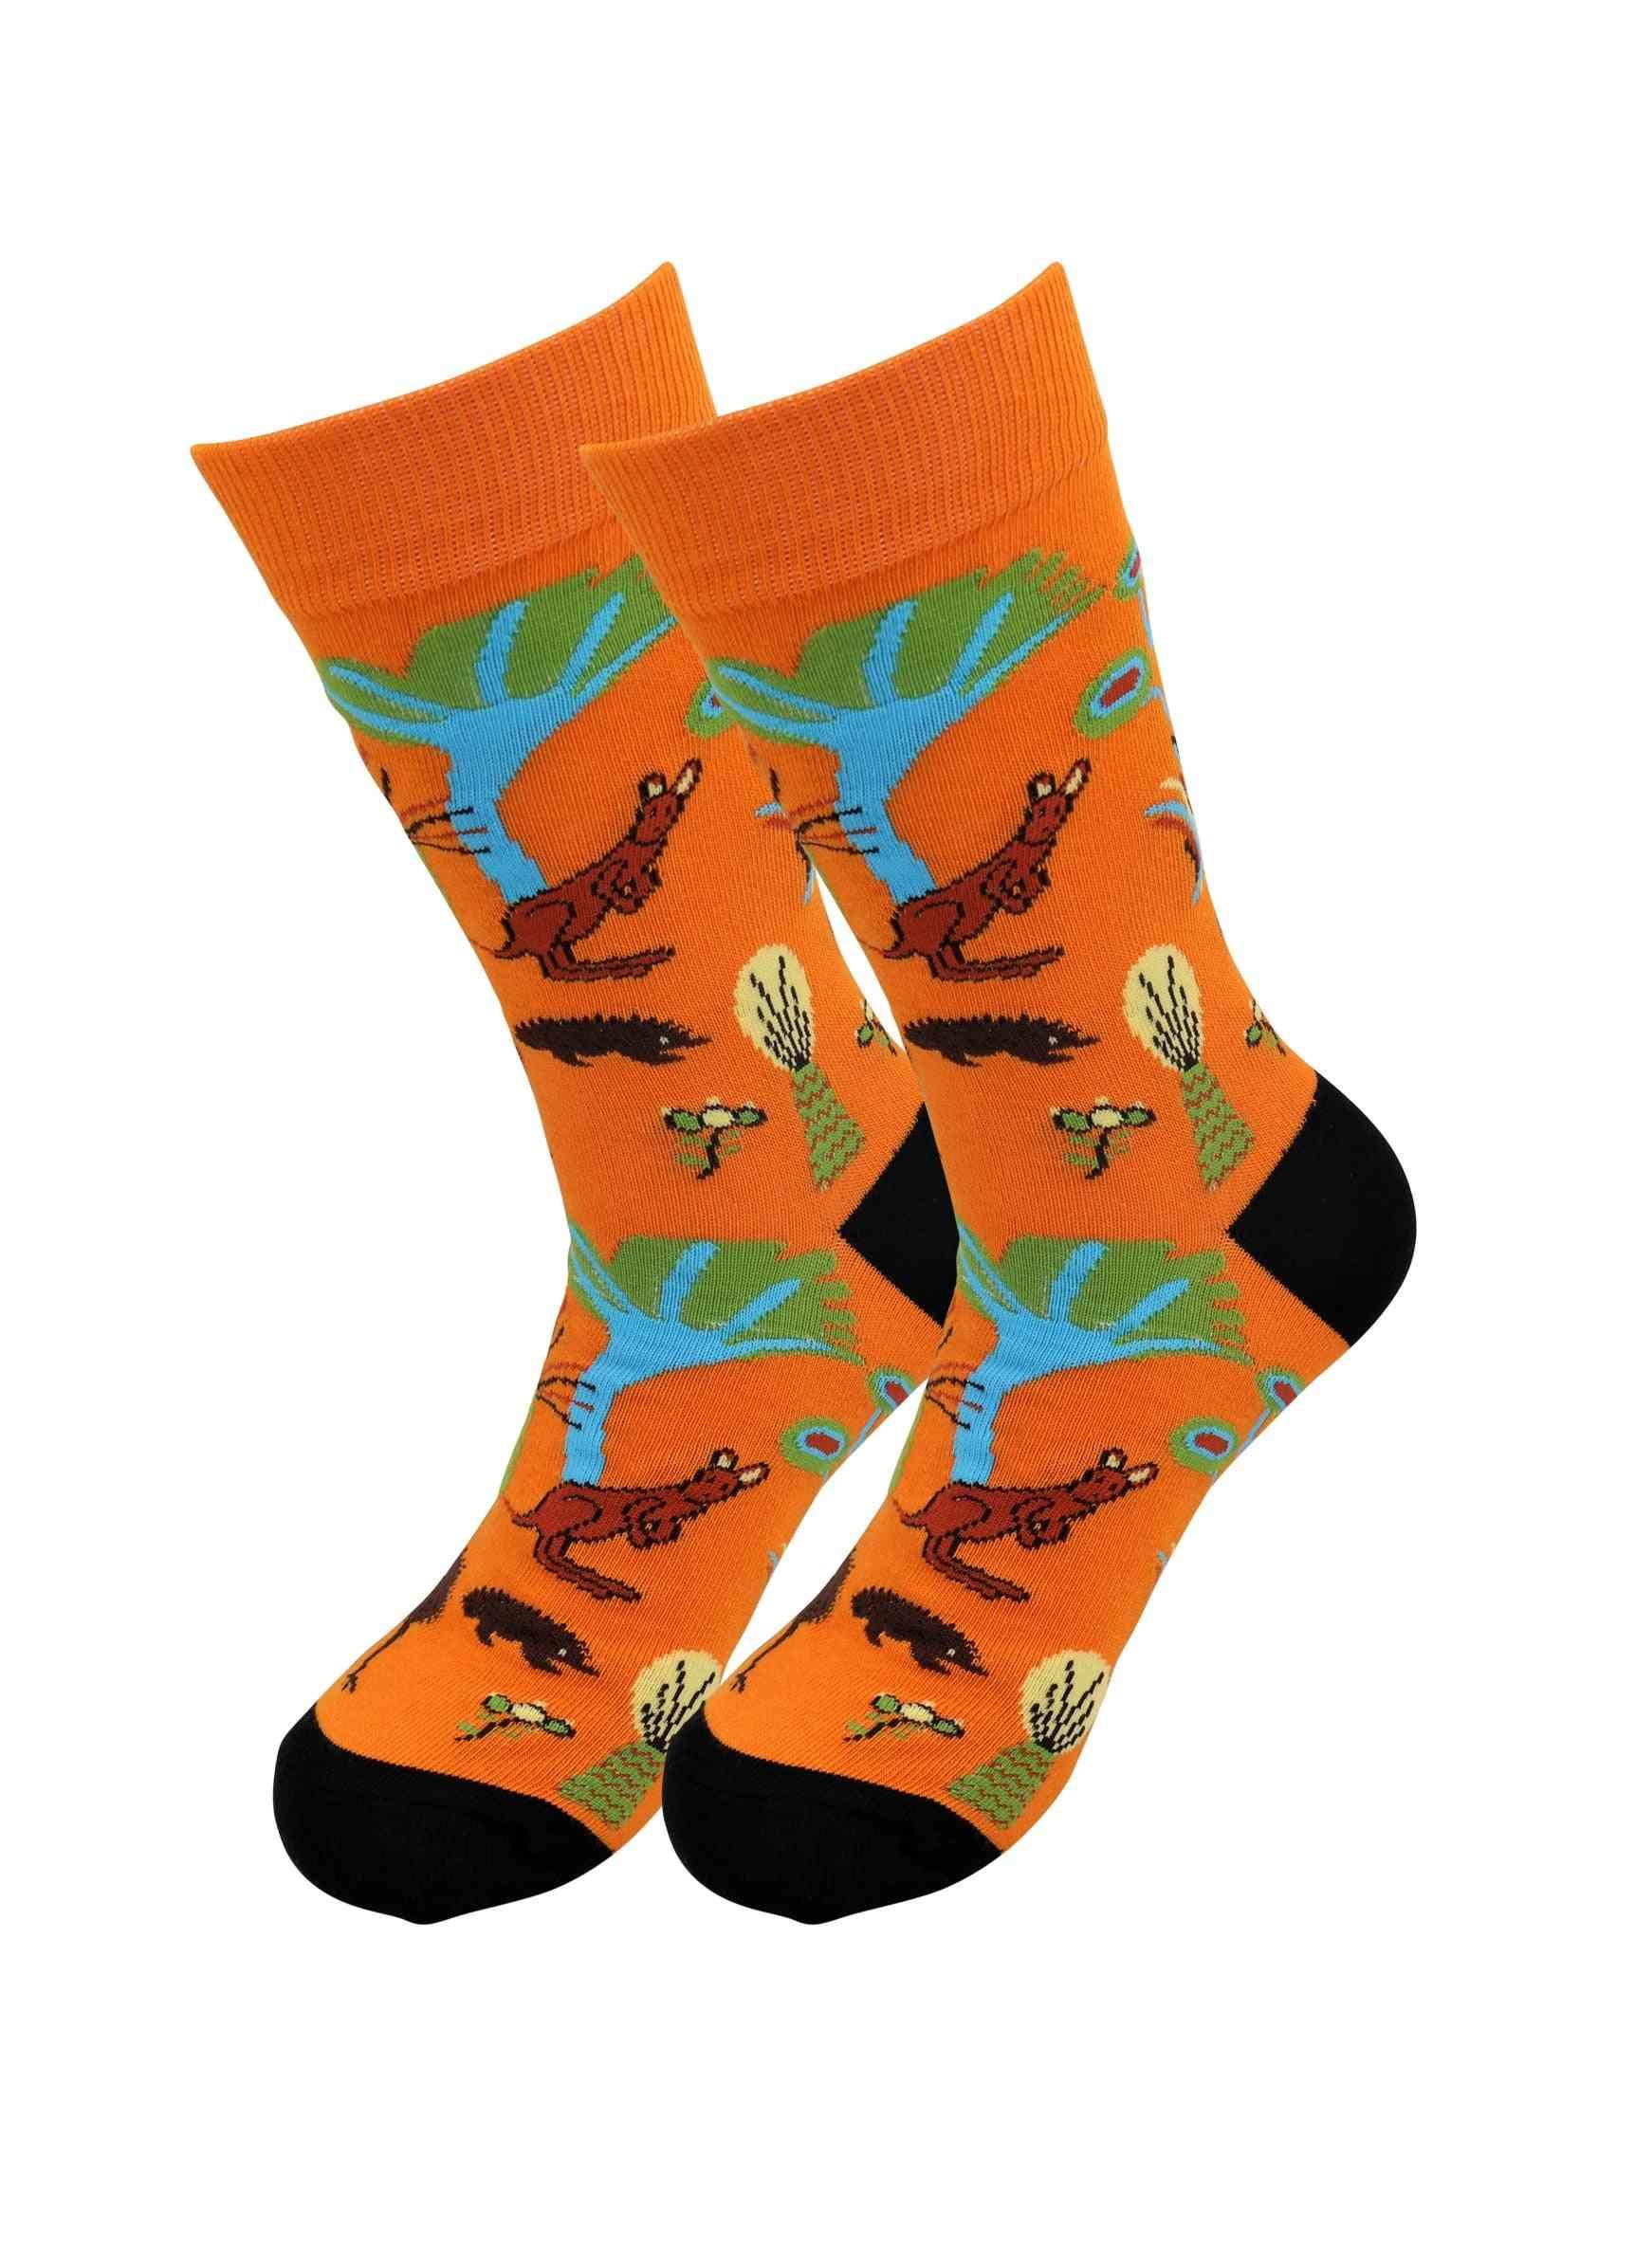 Sick Socks Kangaroo Casual Dress Socks